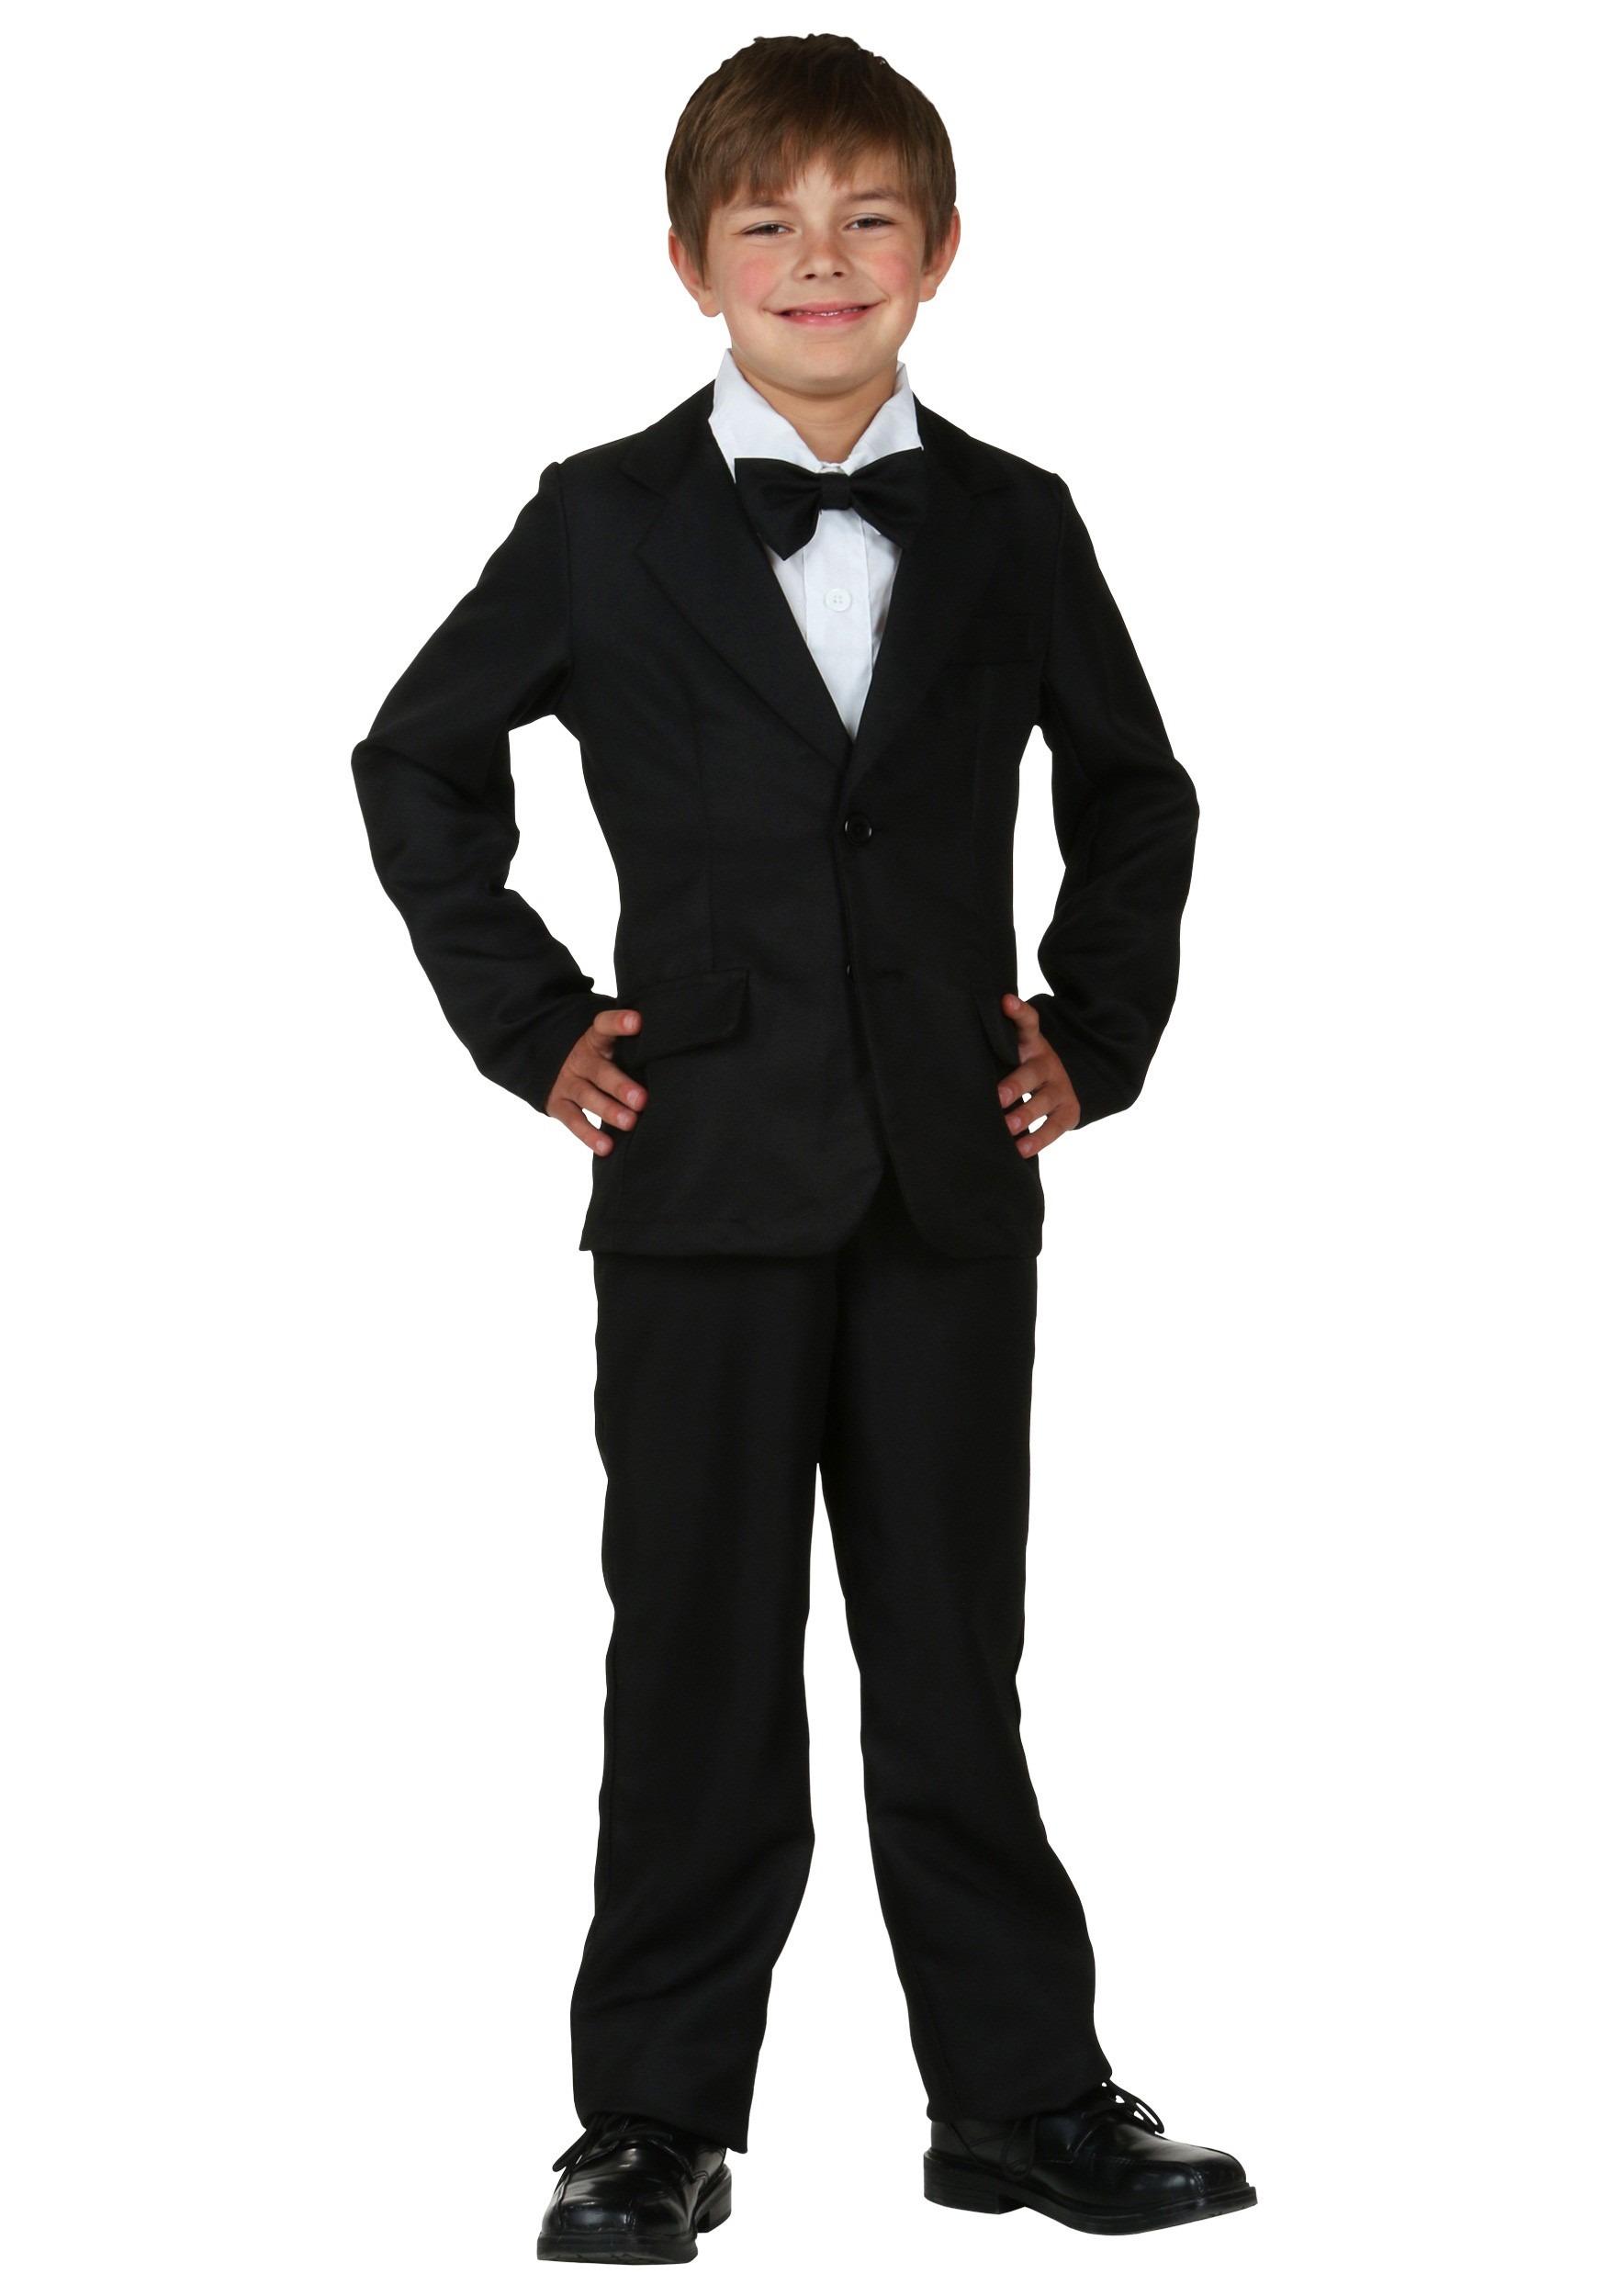 Black Suit for Kids Costume